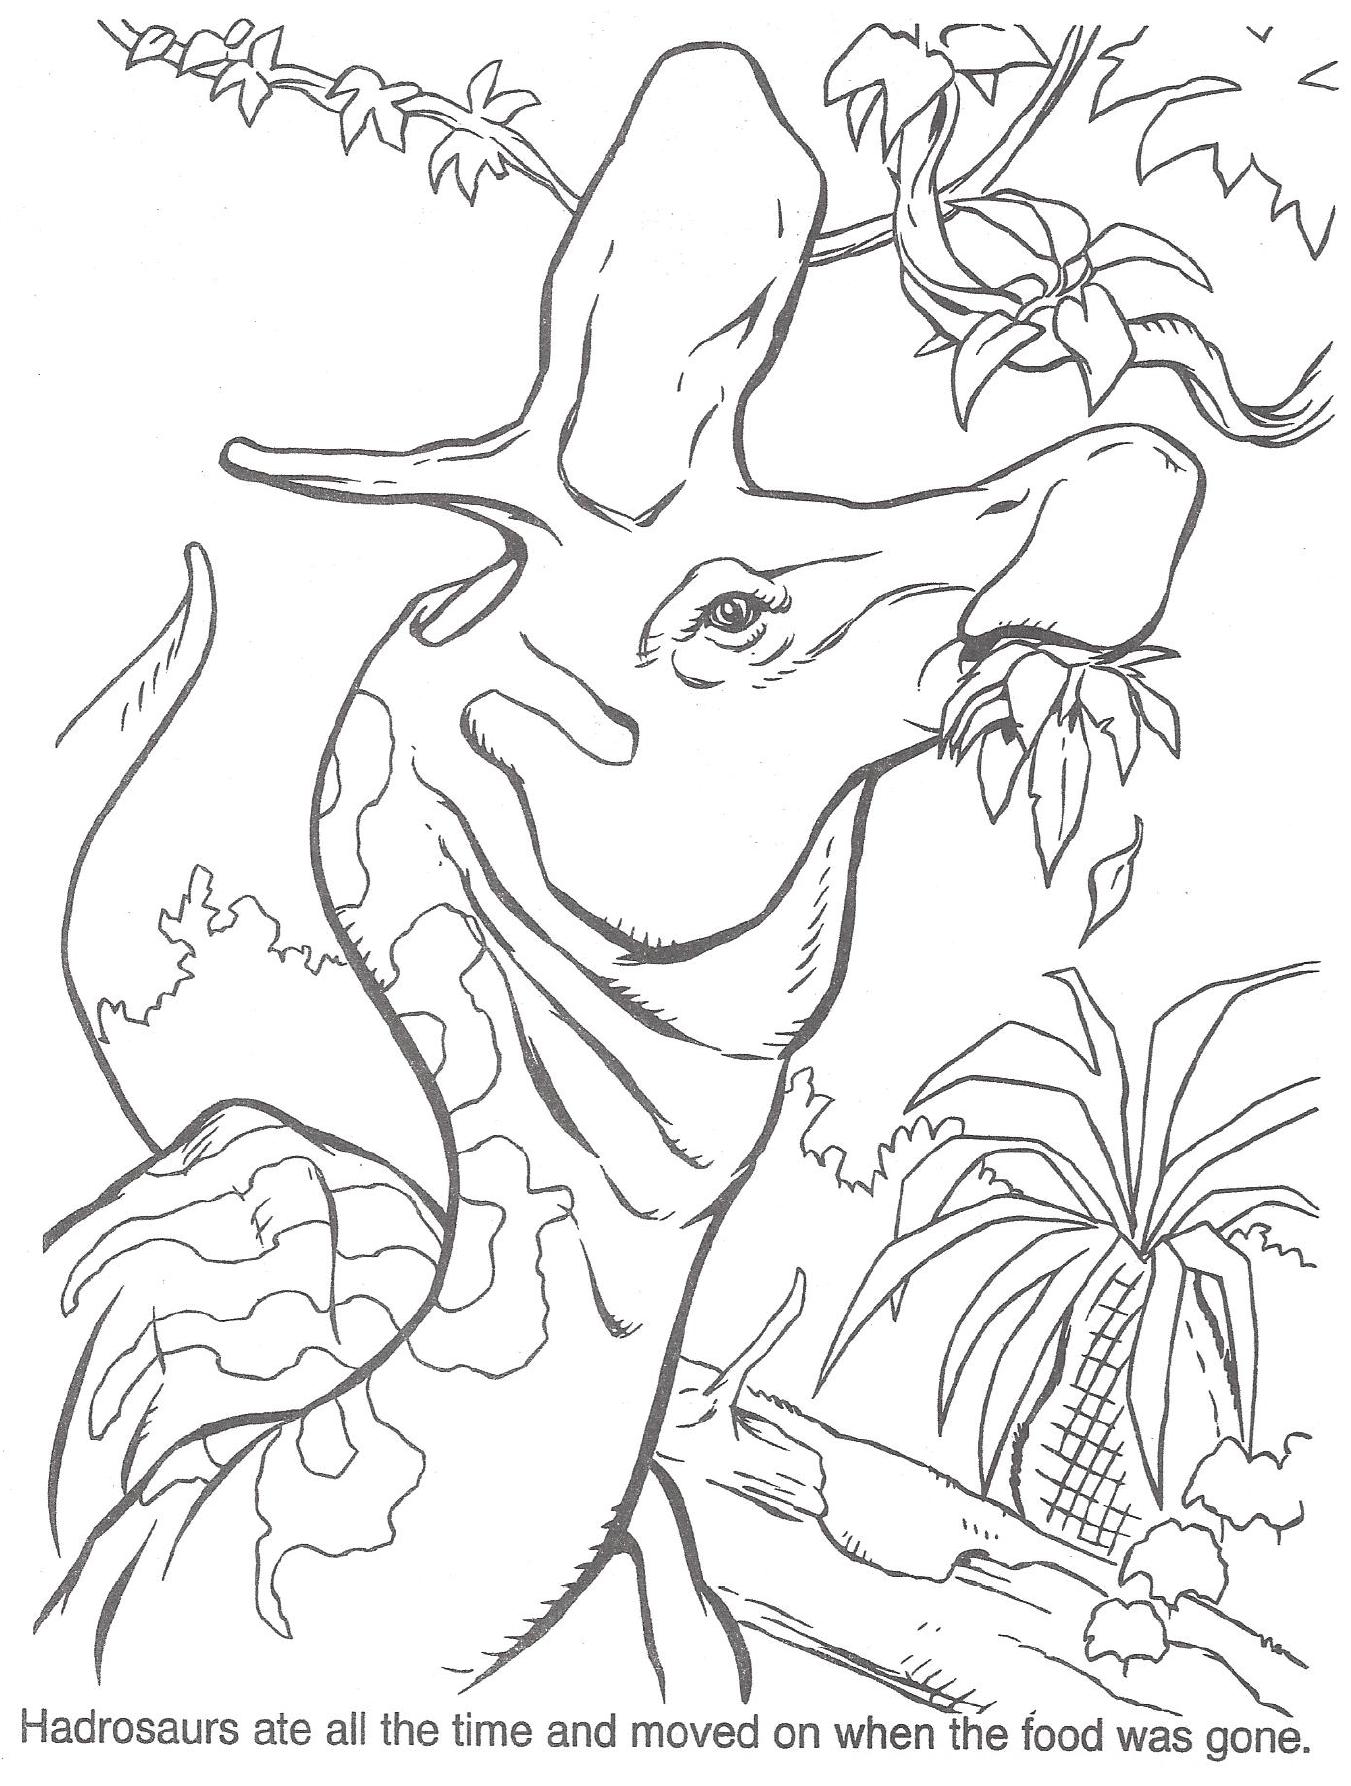 Coloring jurassic world dinosaurs coloring pages on car coloring - Image Tlw Coloring Page 1 Png Jurassic Park Wiki Fandom